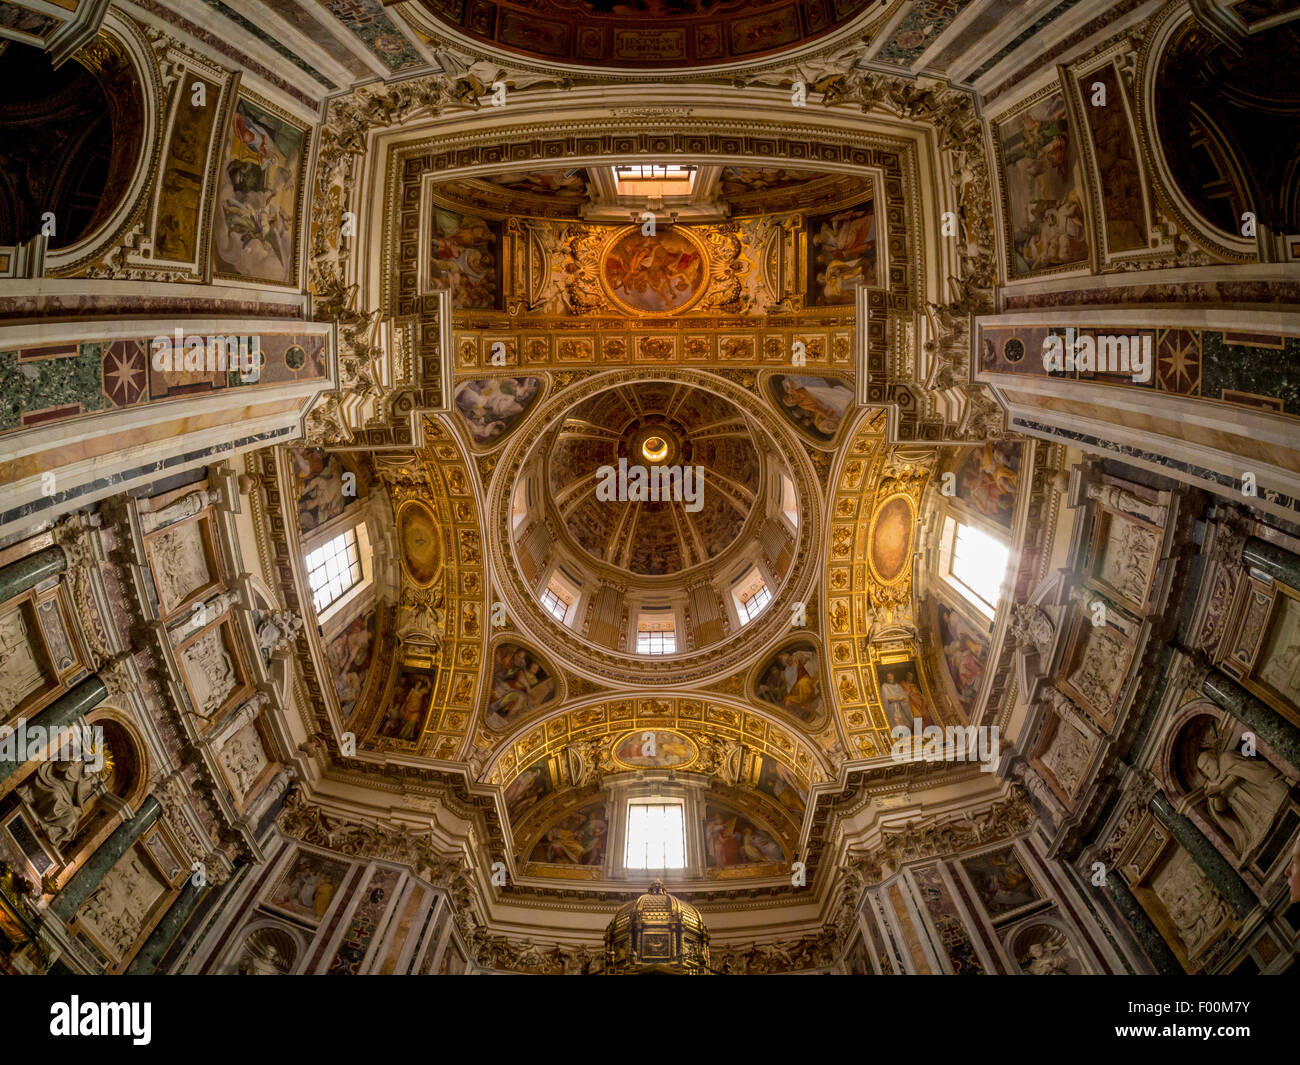 Domed ceiling of Sistine Chapel and Oratory of the Nativity. The Basilica di Santa Maria Maggiore. Rome, Italy. Stock Photo